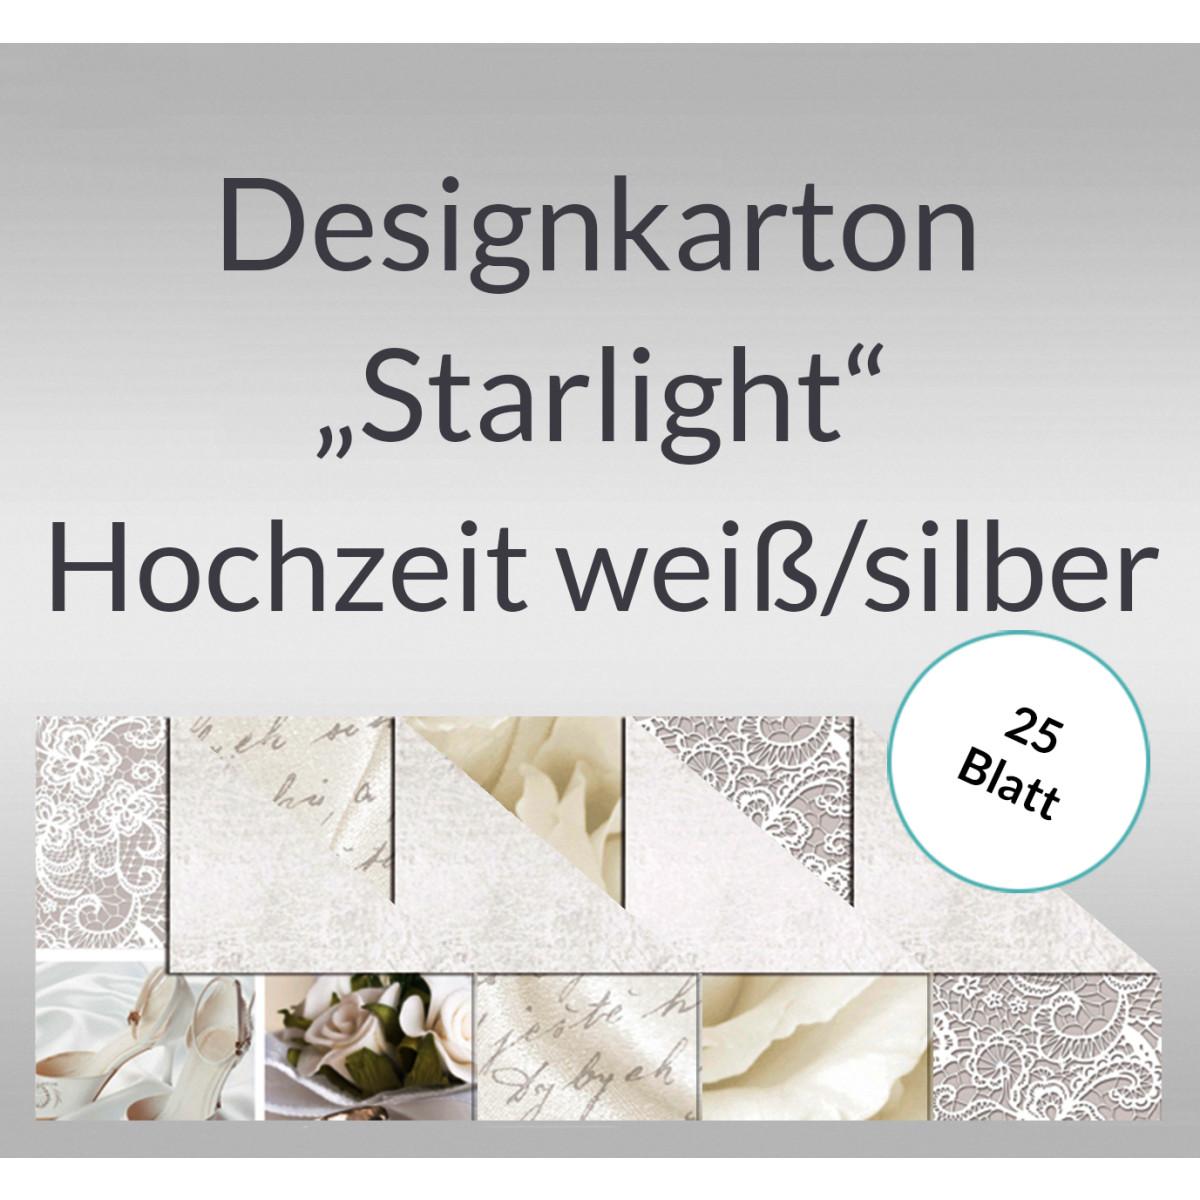 "Designkarton ""Starlight"" Hochzeit weiß/silber DIN A4 - 25 Blatt"